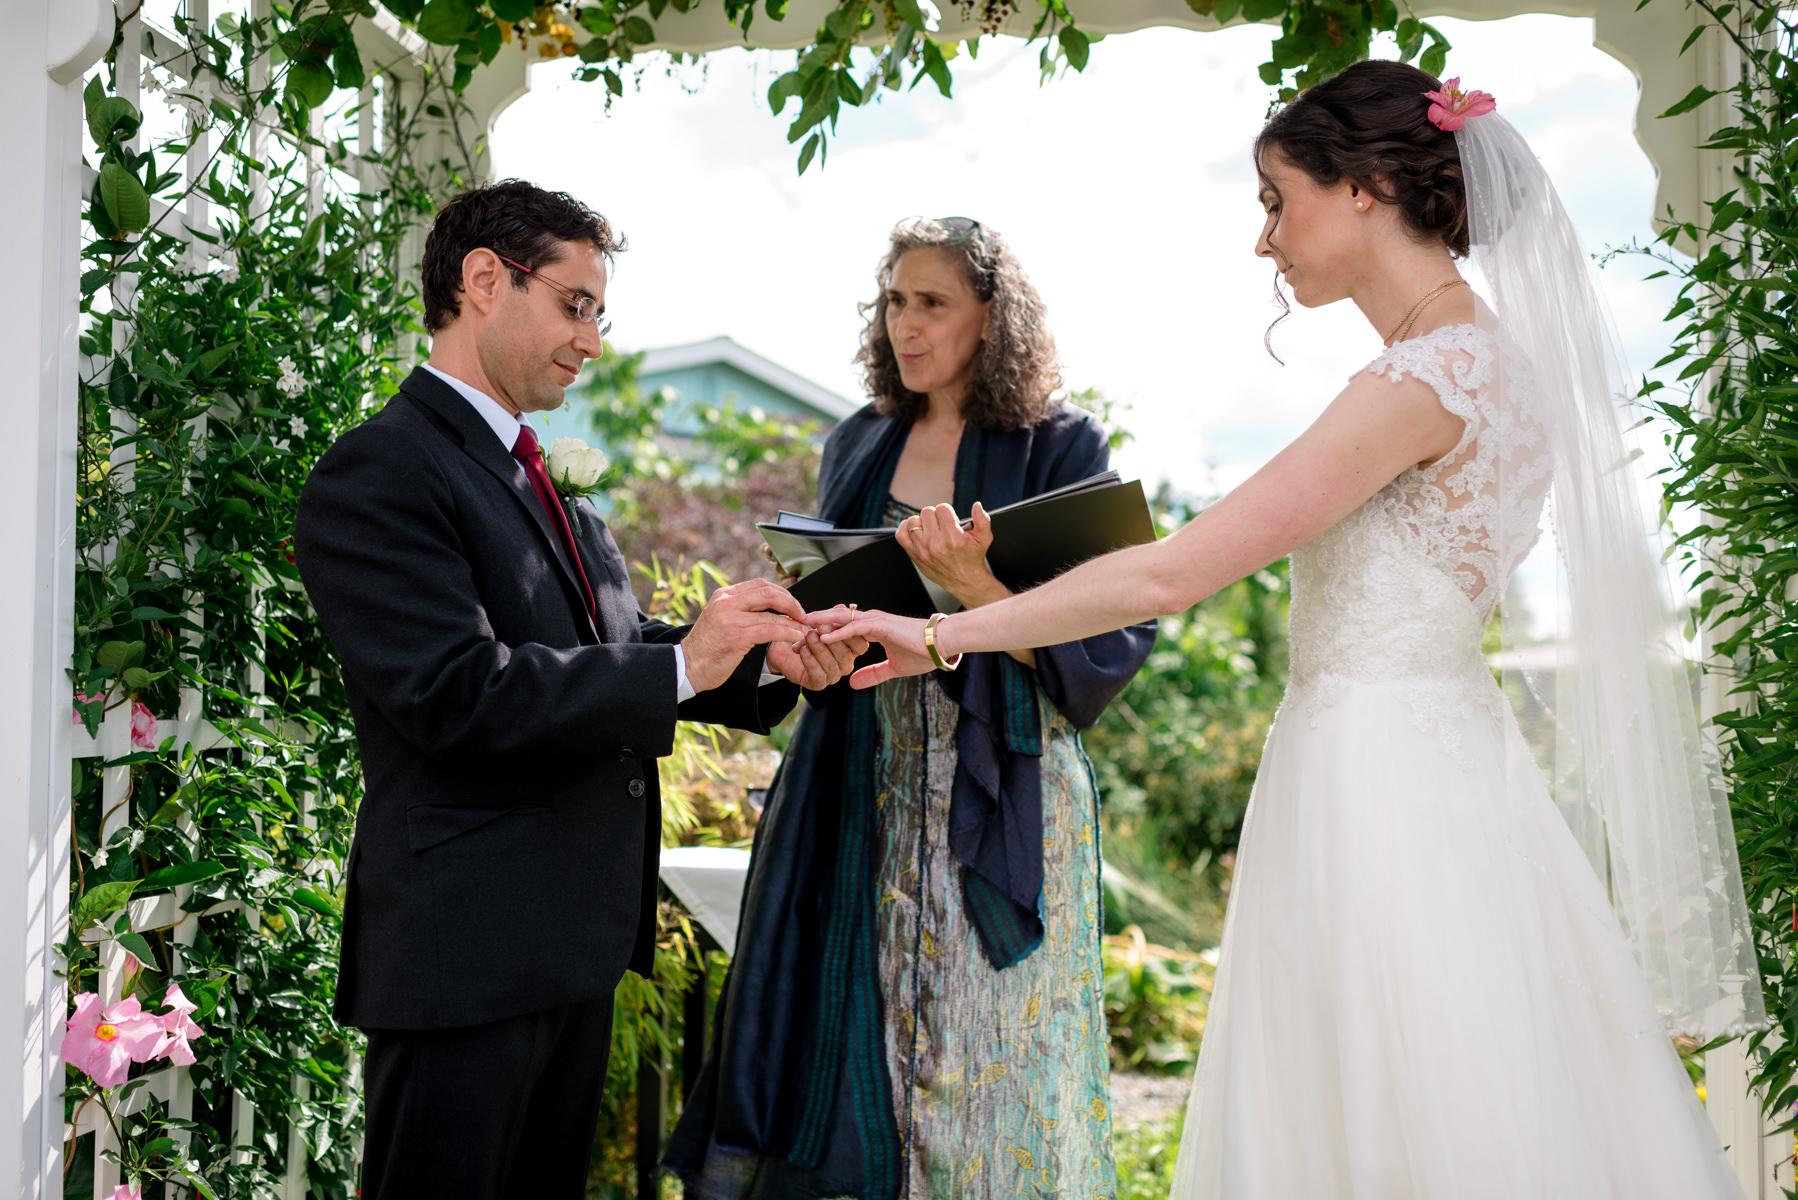 Andrew Tat - Documentary Wedding Photography - Kirkland, Washington - Emily & Cuauh - 12.JPG